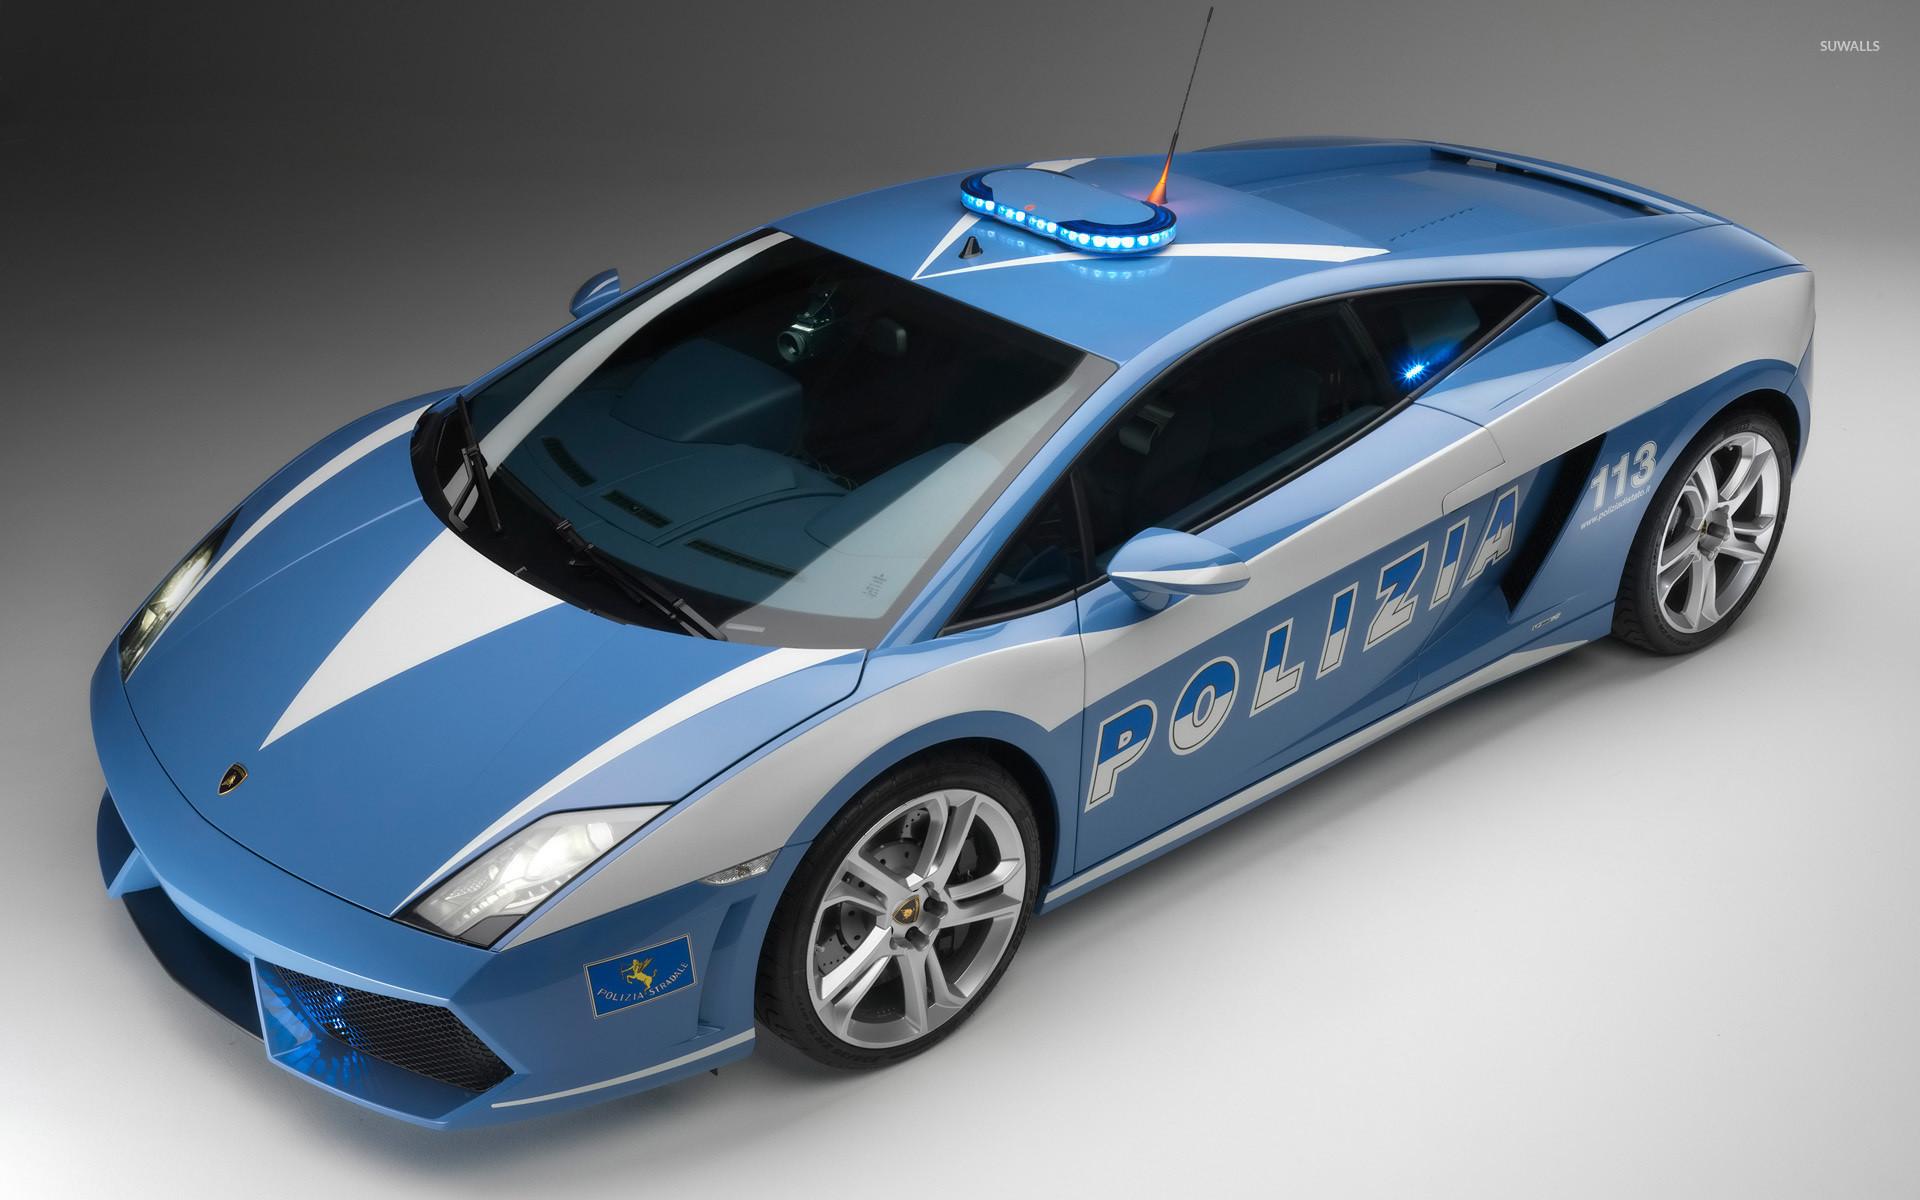 Lamborghini Gallardo police car wallpaper